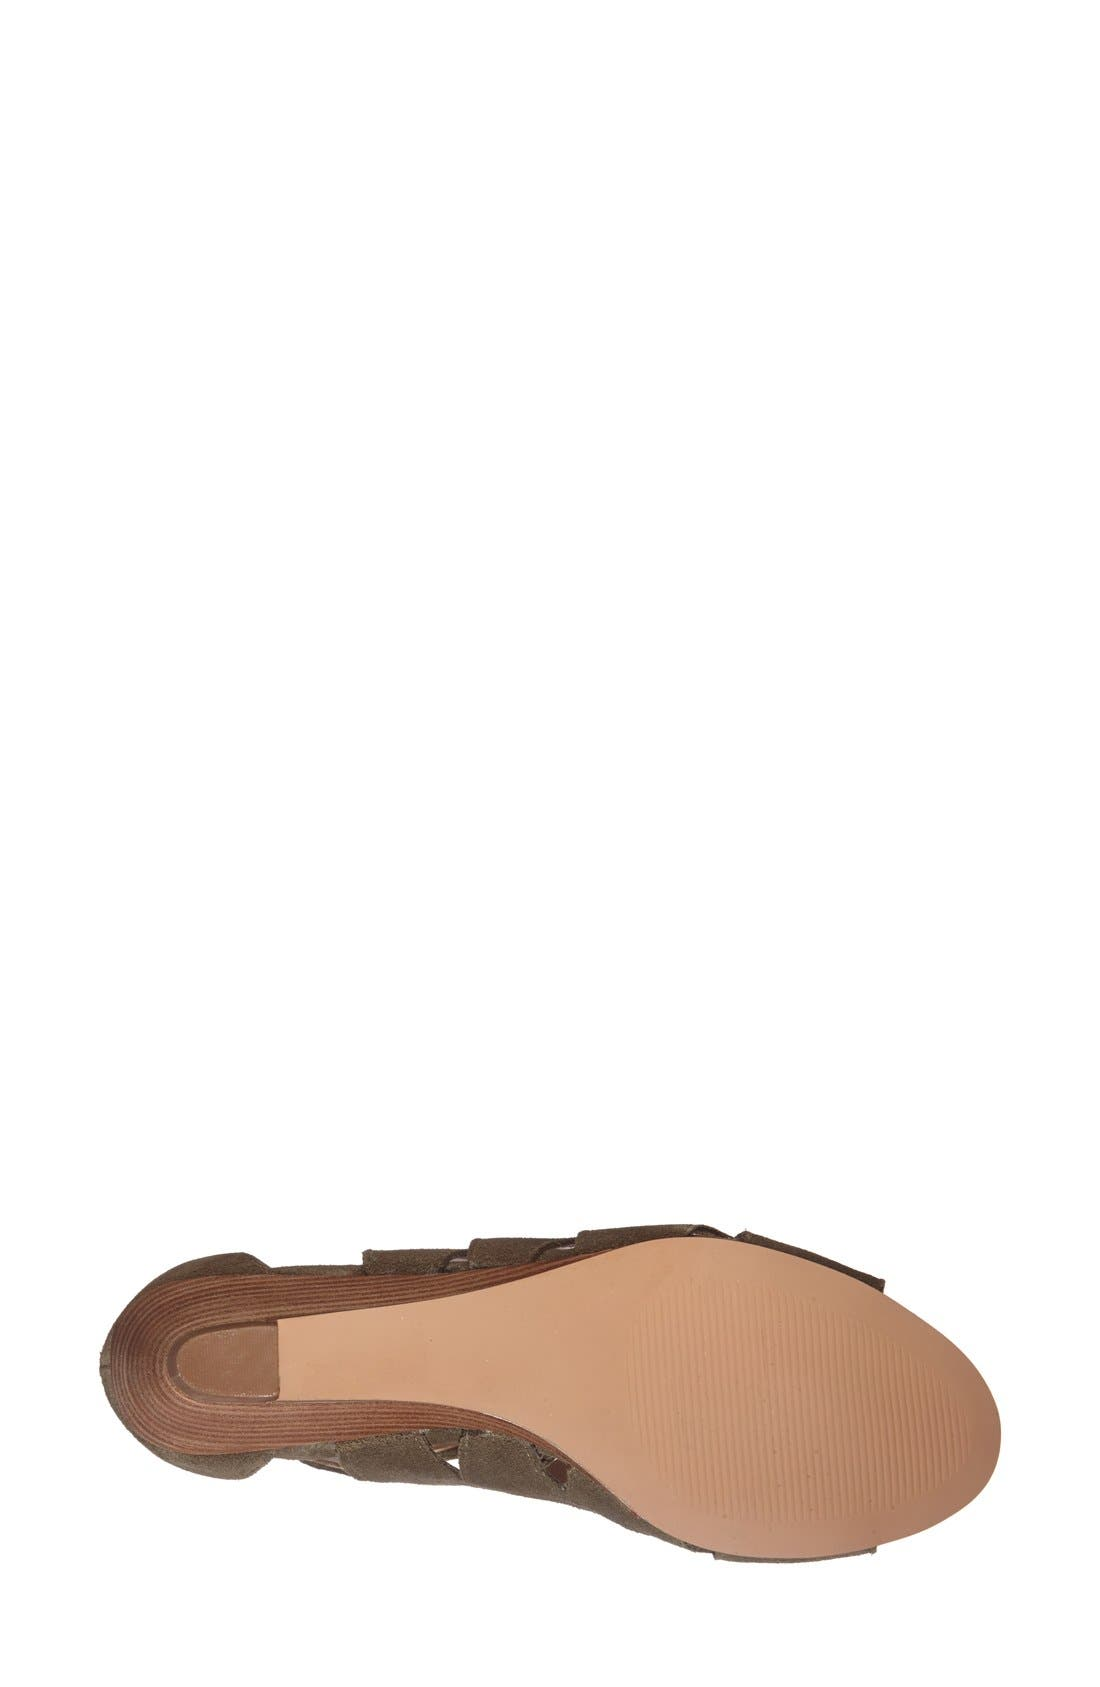 Alternate Image 4  - Sole Society 'Freyaa' Wedge Sandal (Women)